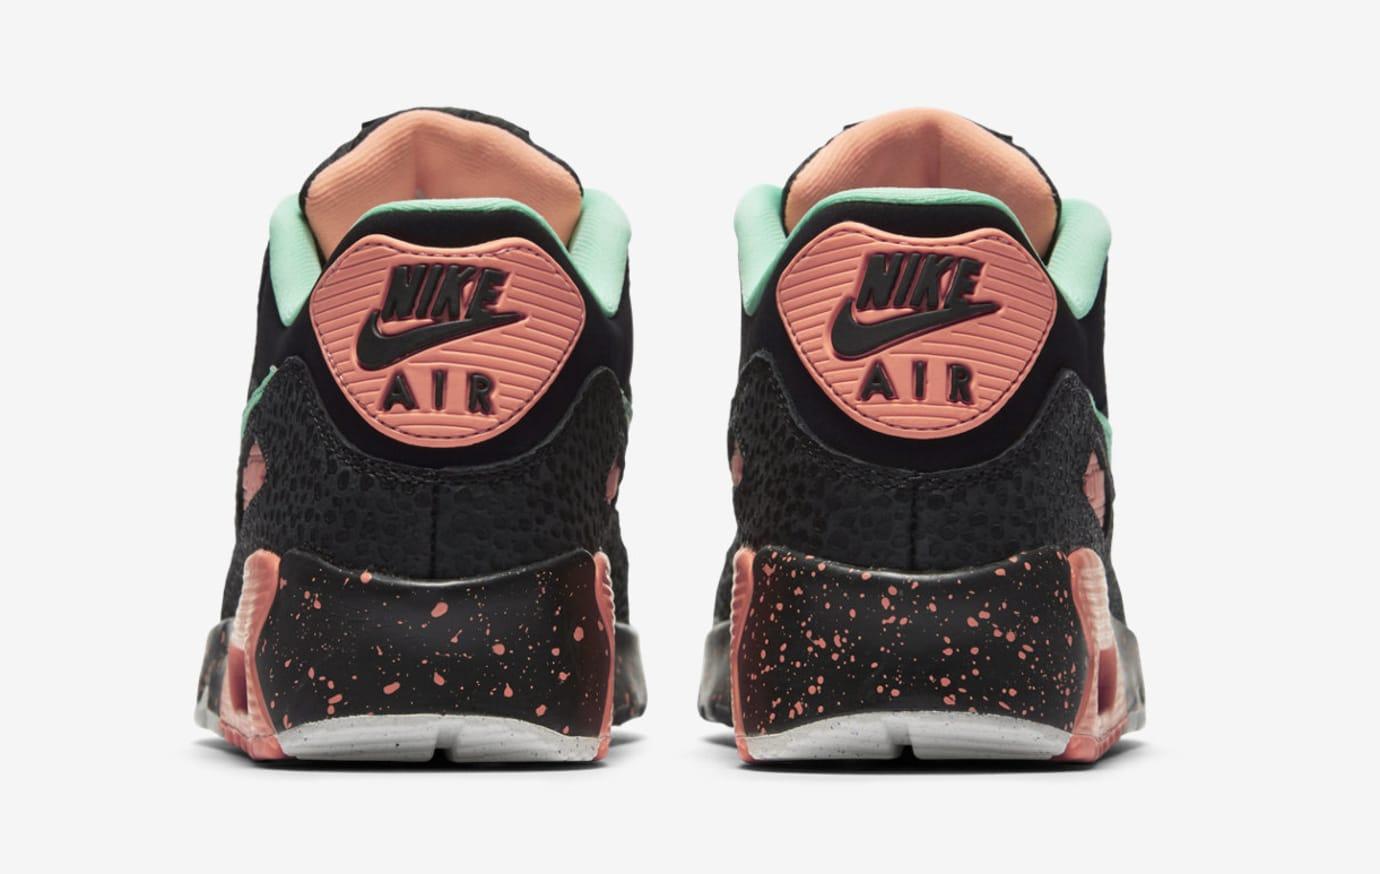 Nike Air Max 90 GS AJ2776-001 (Heel)